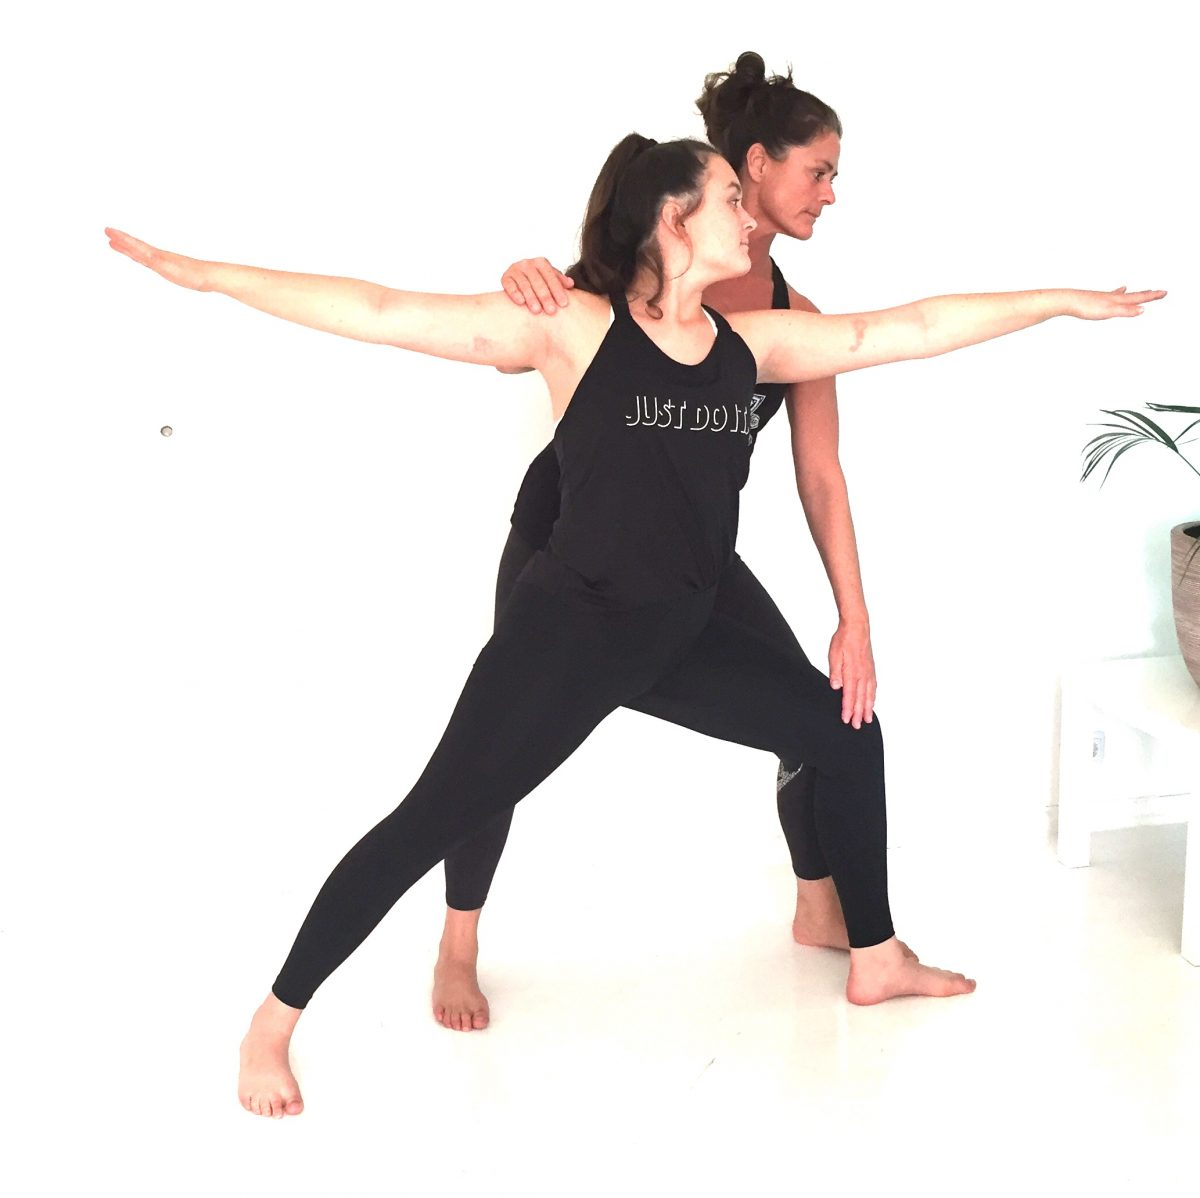 yogaausbildung-haltung-korrigieren-krieger